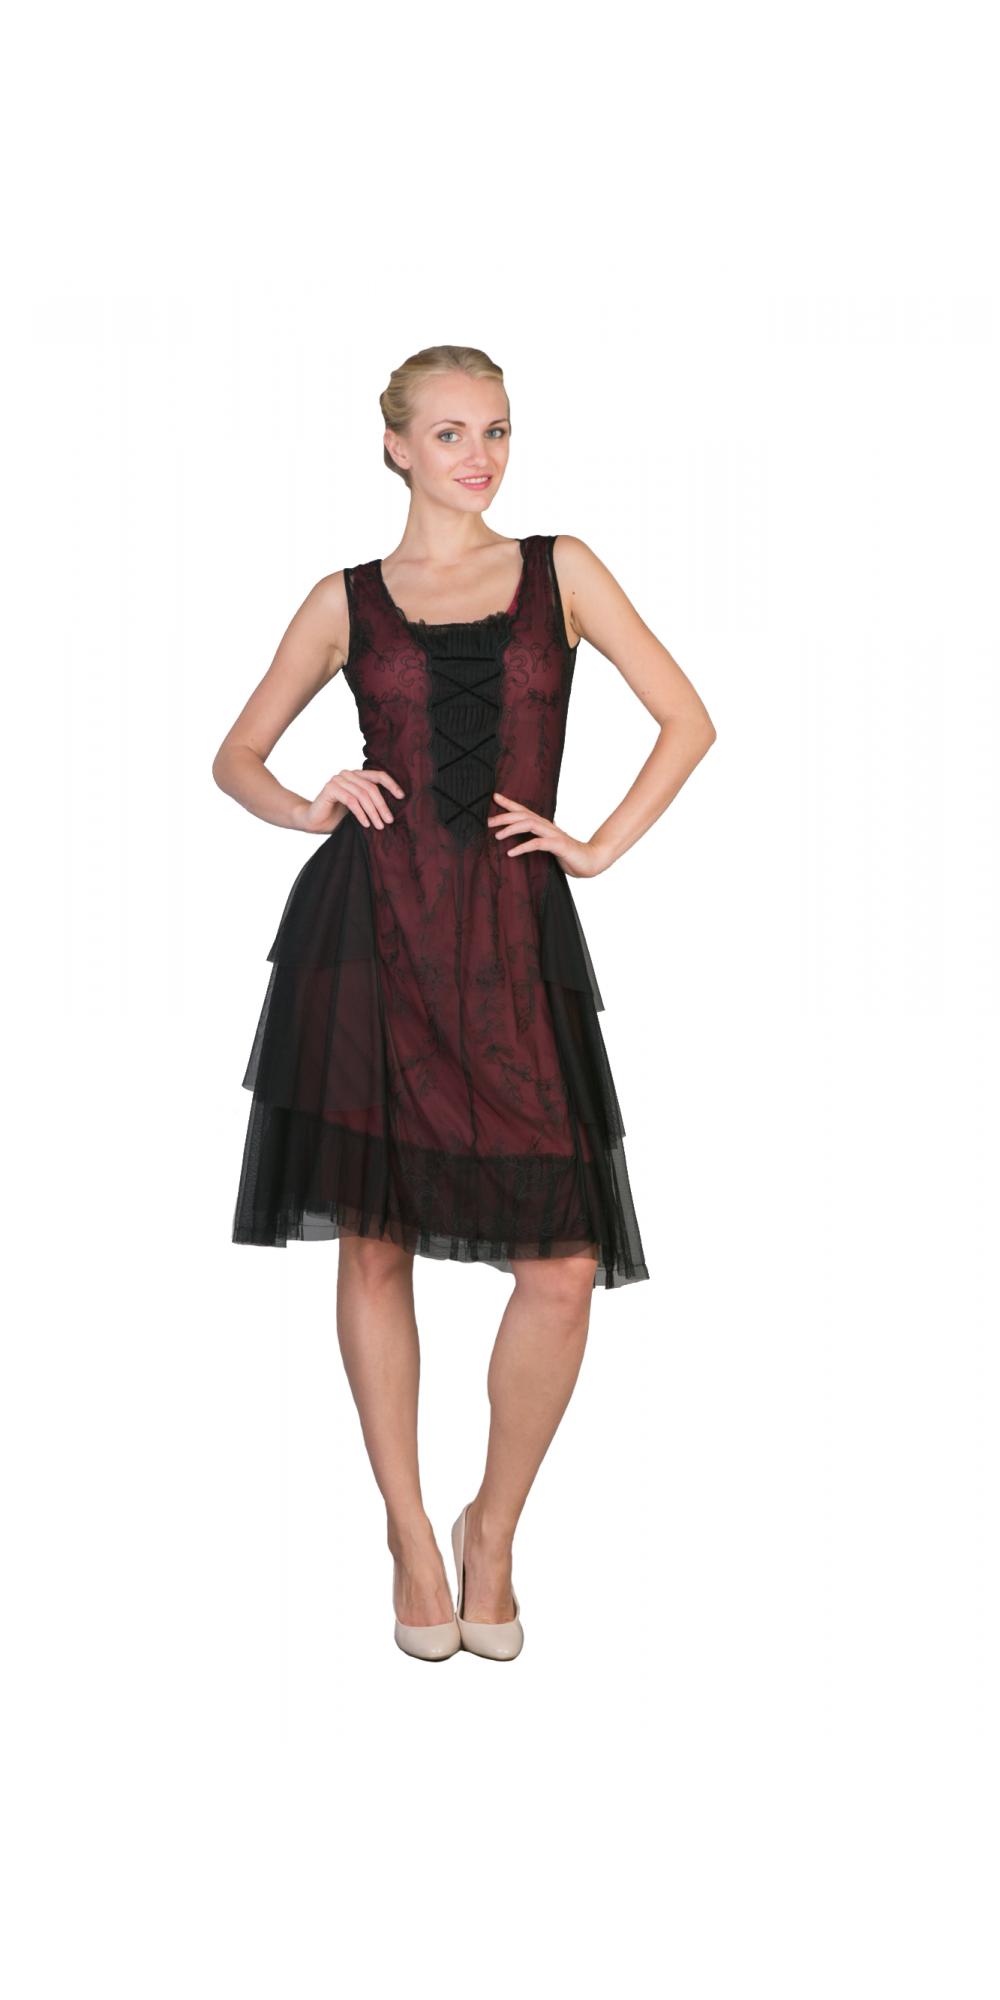 Chic Party Dress In Black Burgundy By Nataya